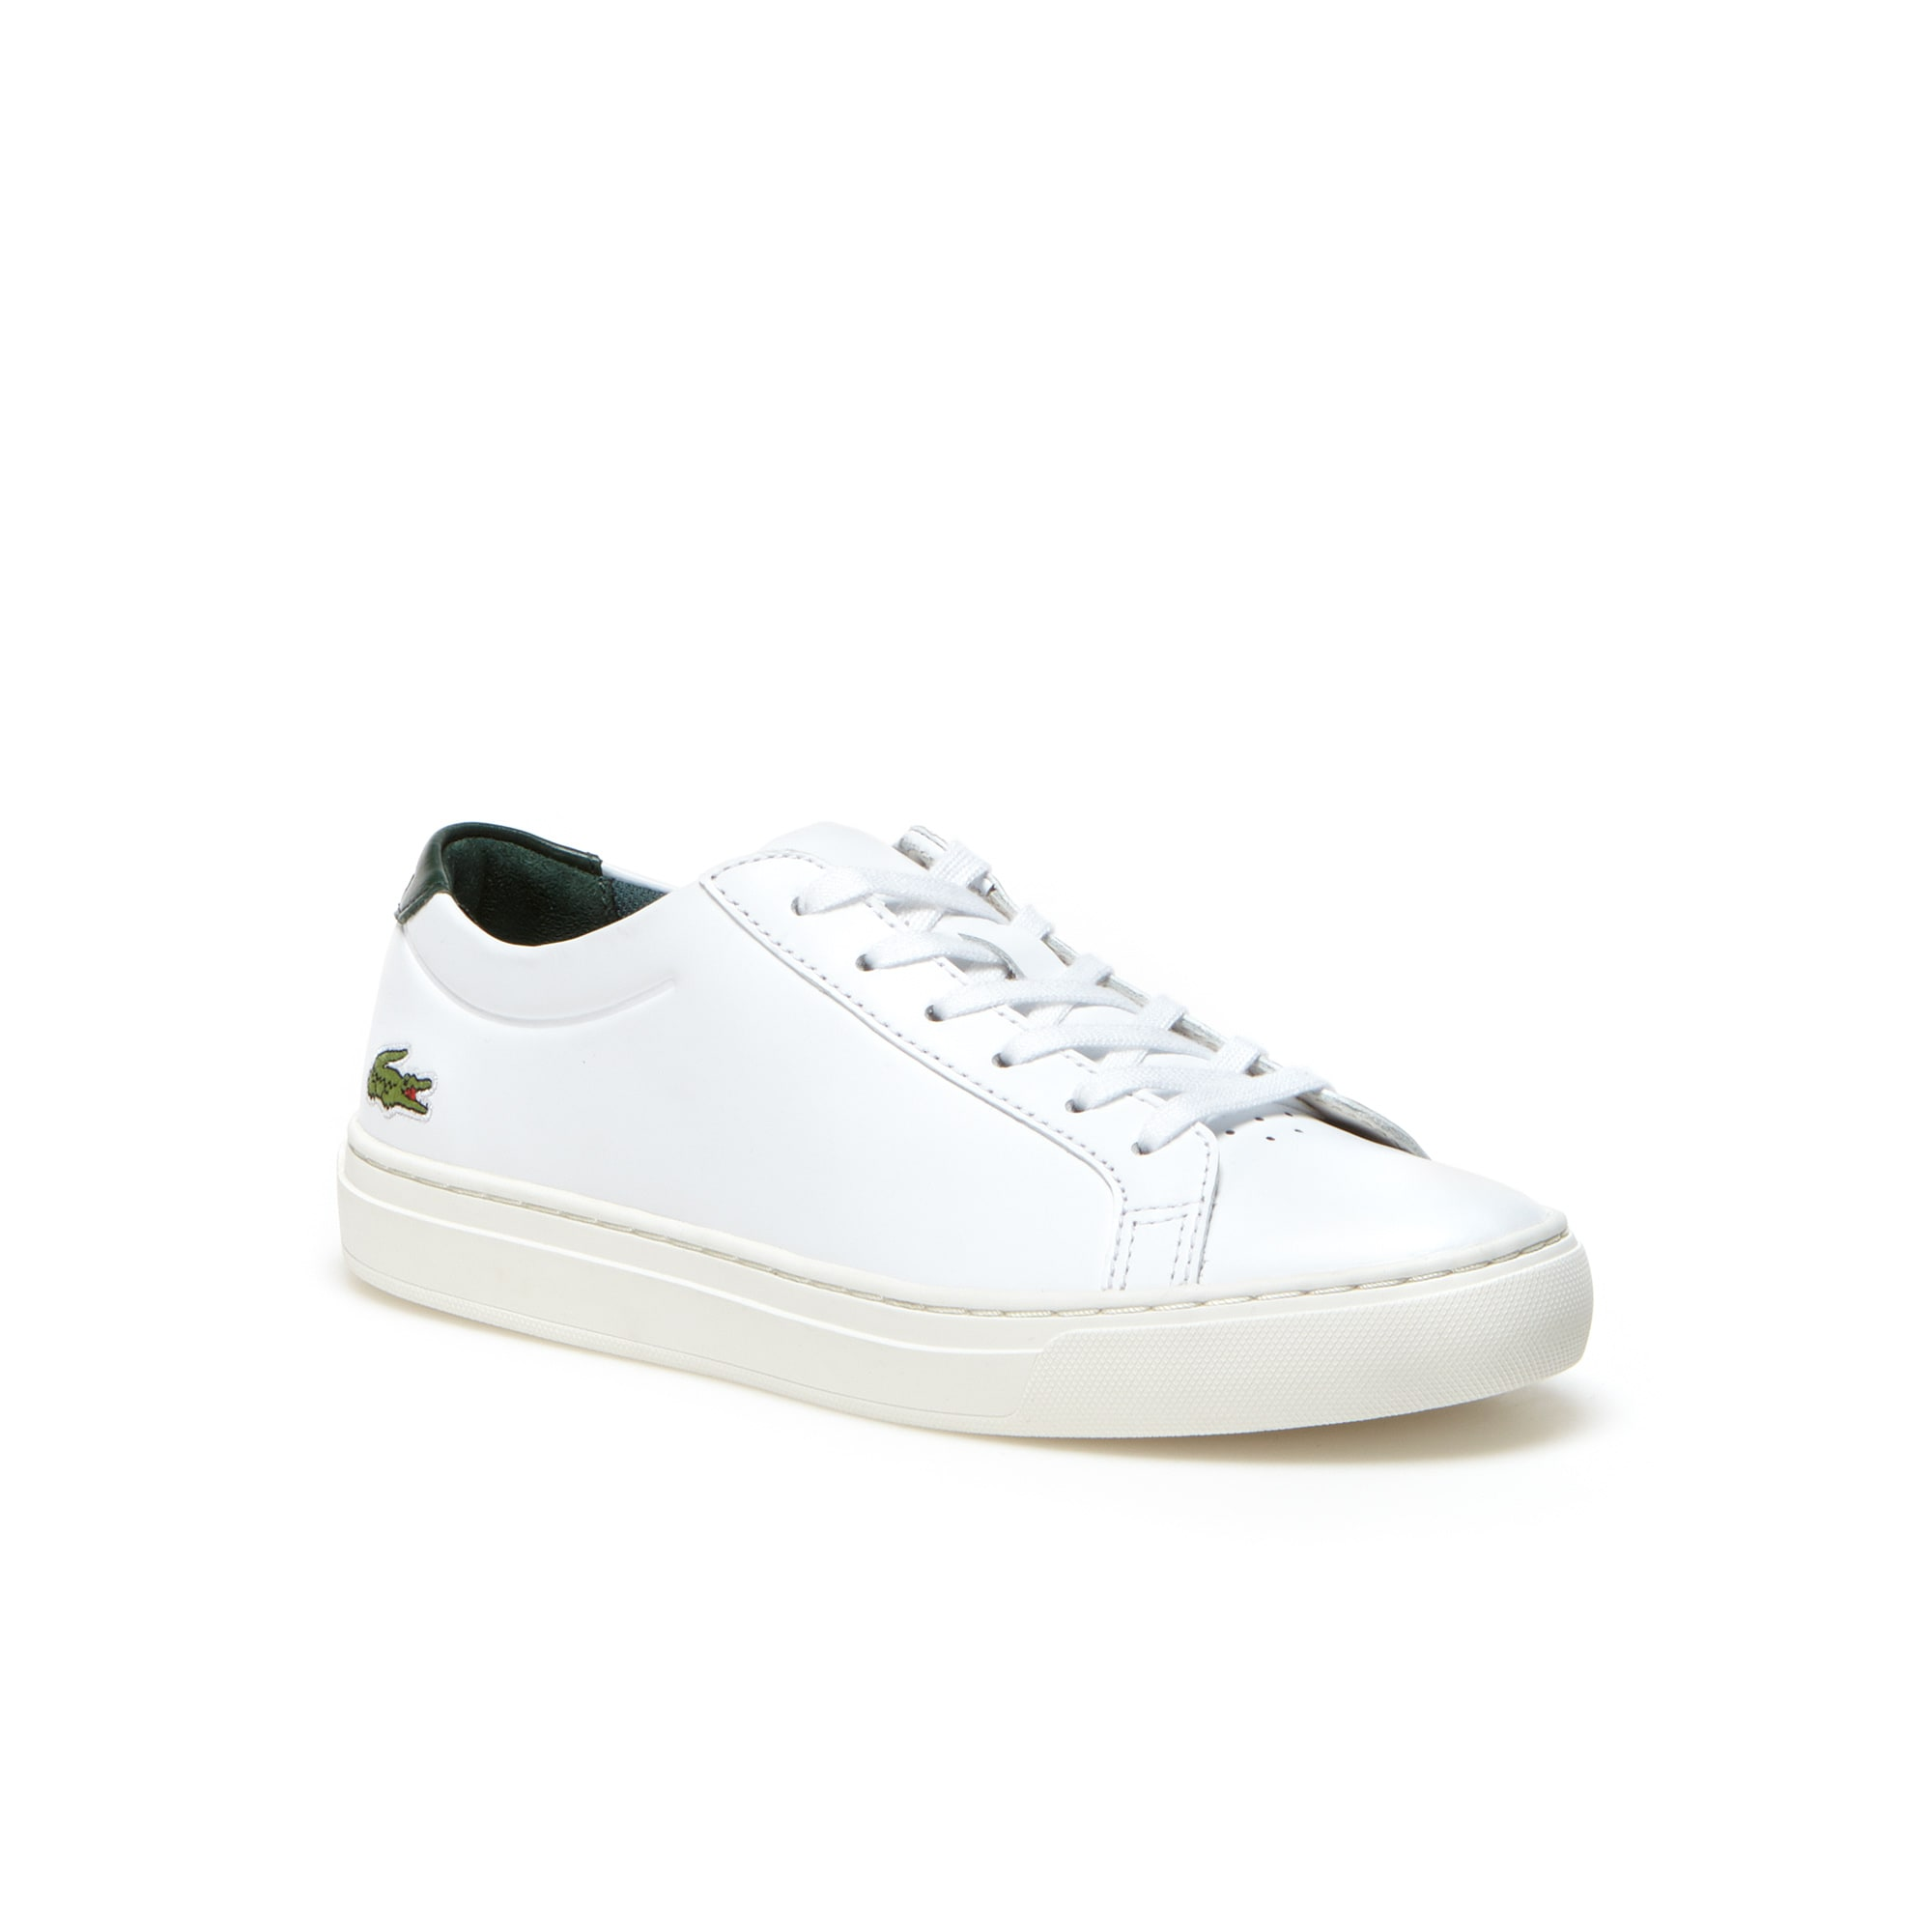 Women's L.12.12 Leather Sneakers